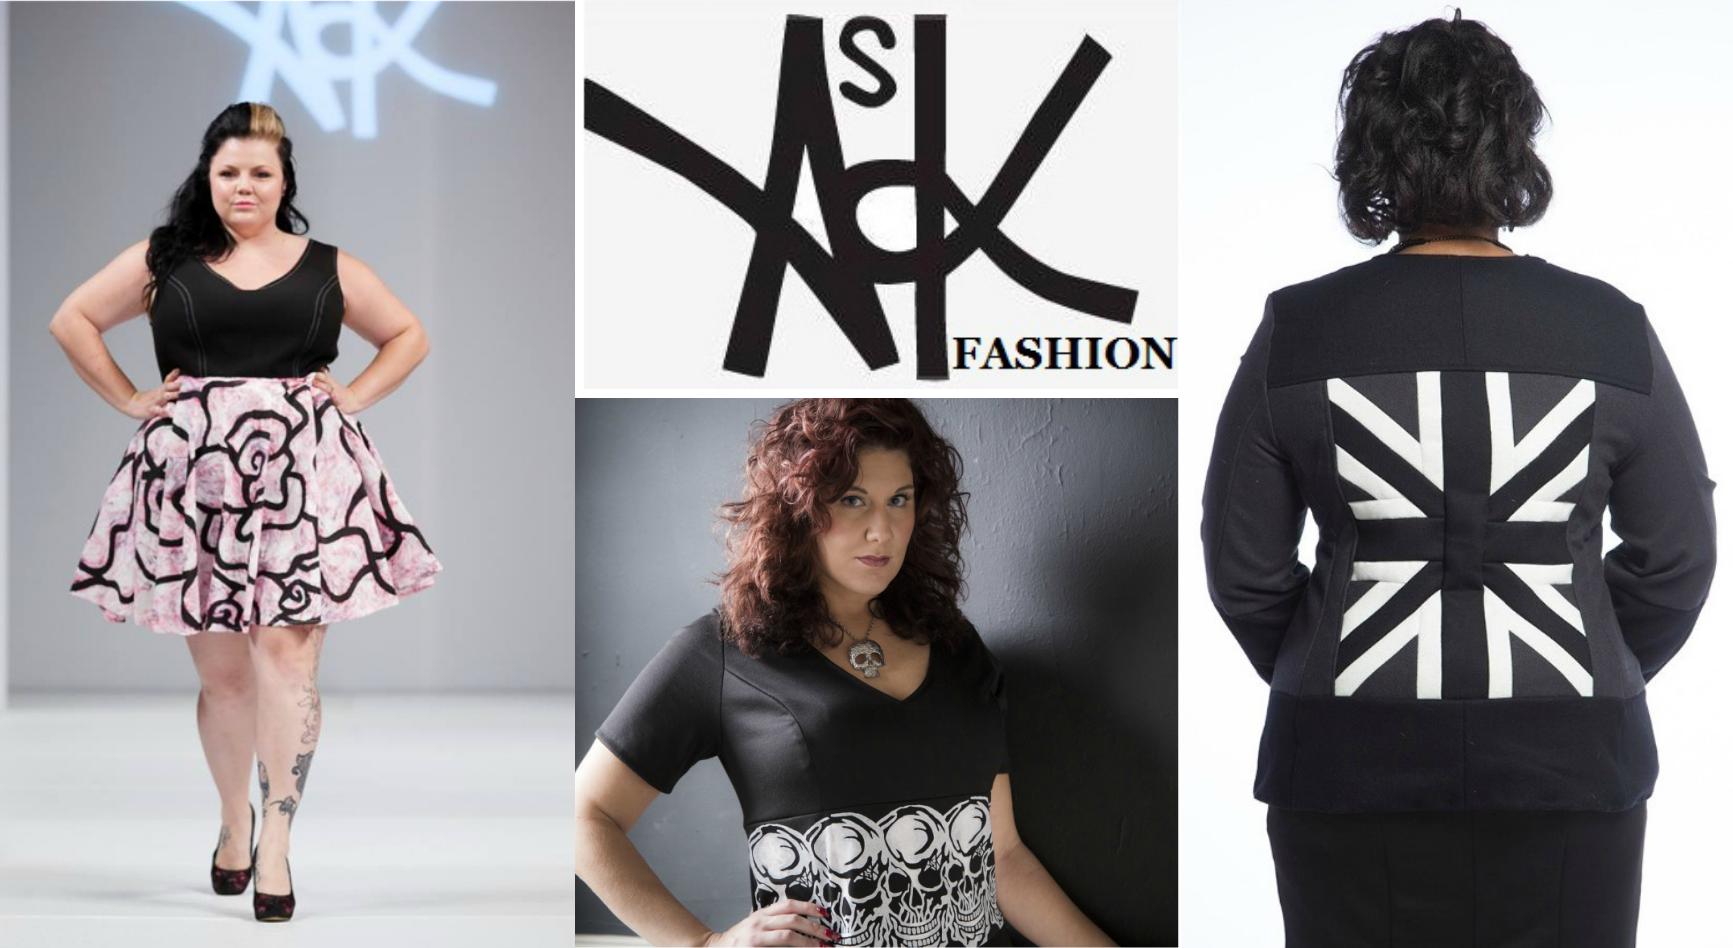 ASK Fashion: Rock Star Fashion For the Curvy Woman